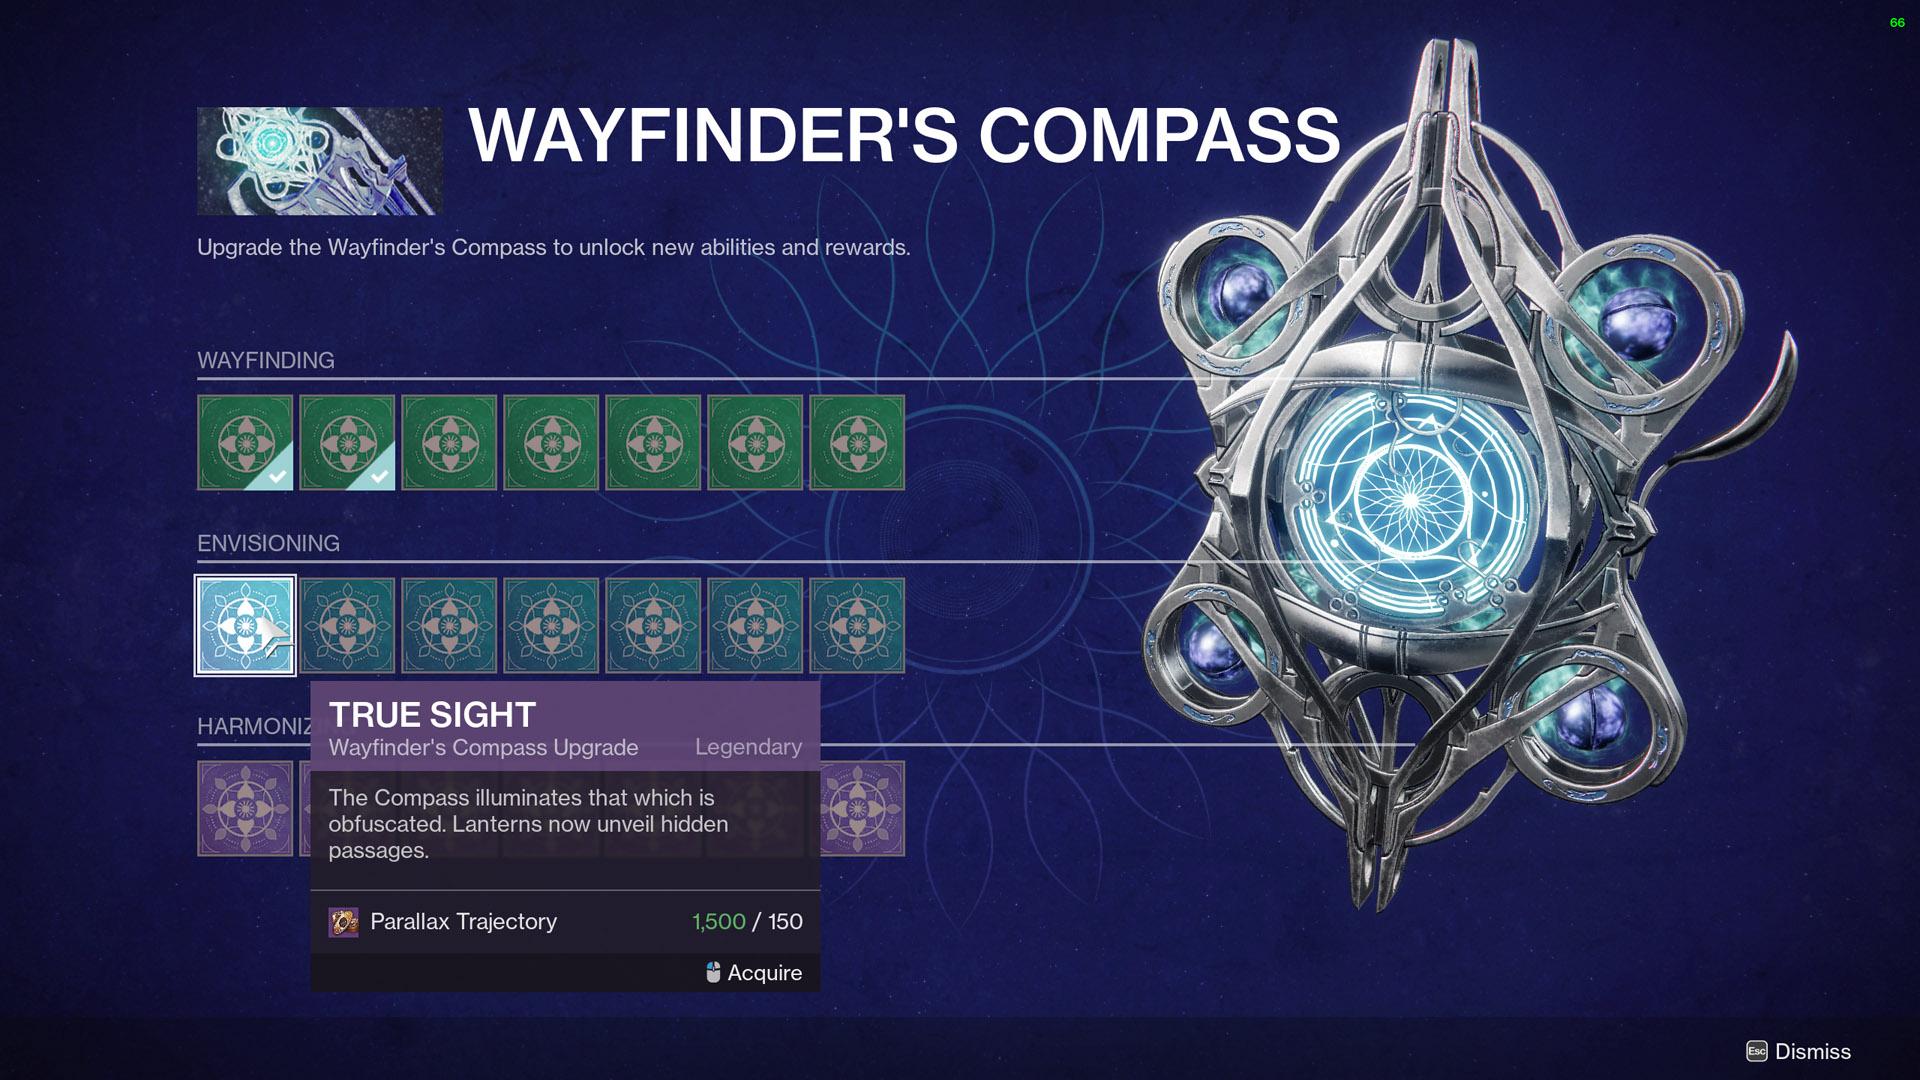 destiny 2 wayfinder's compass the sight